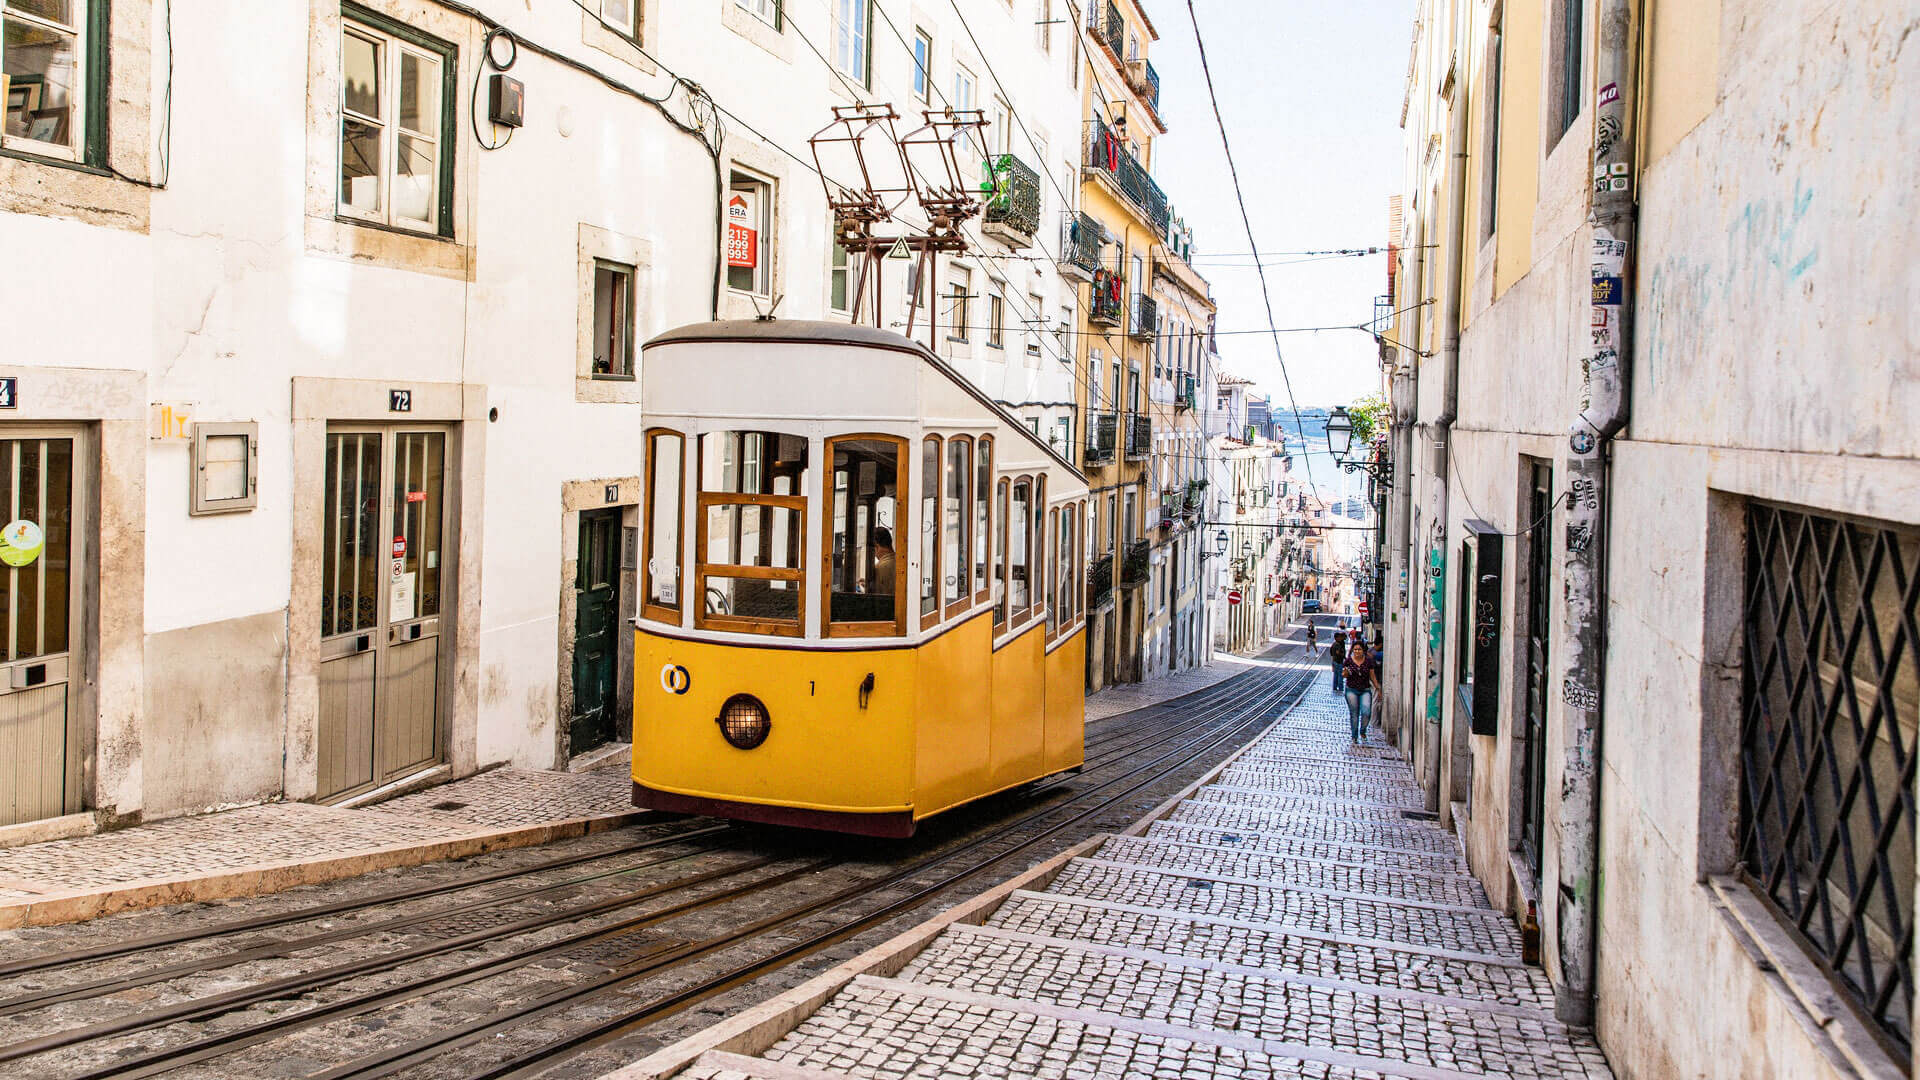 Elétrico sobe rua de Lisboa